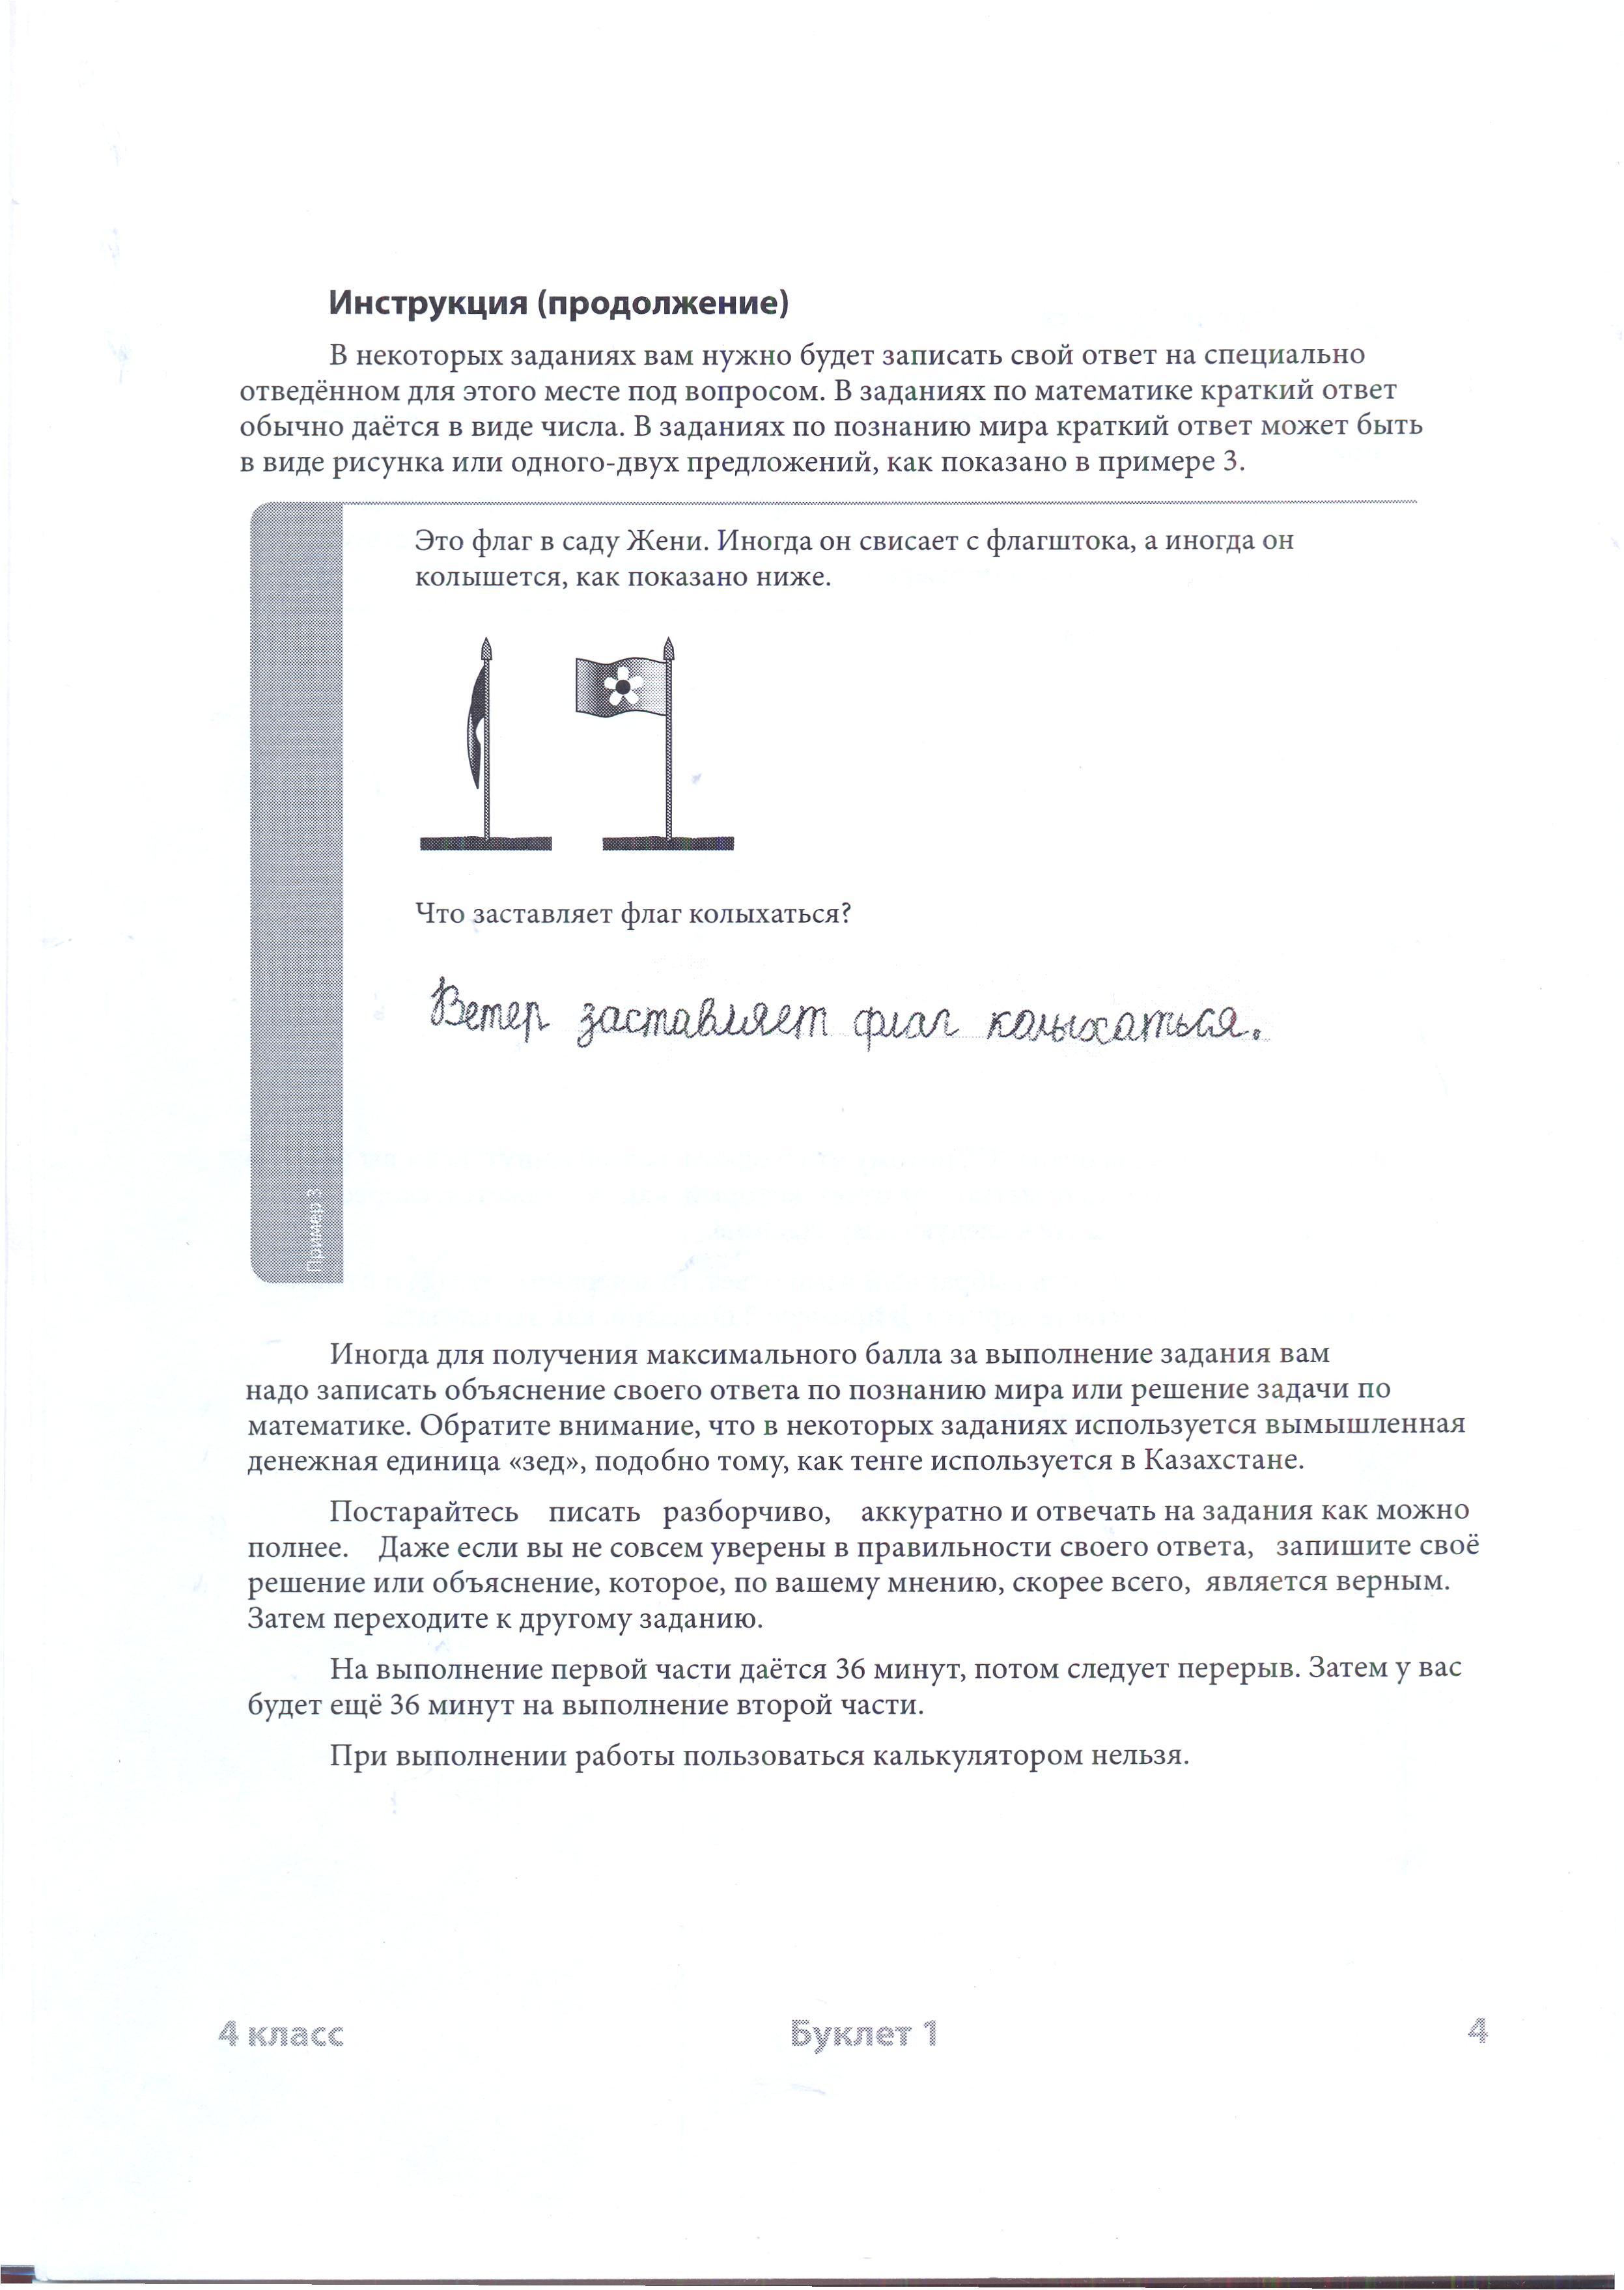 H:\Доклад ТИМСС Алматы 8.04.2014\TIMSS MATEM 4 kl_1 var\Matematic_4 kl_1 var0002.jpg